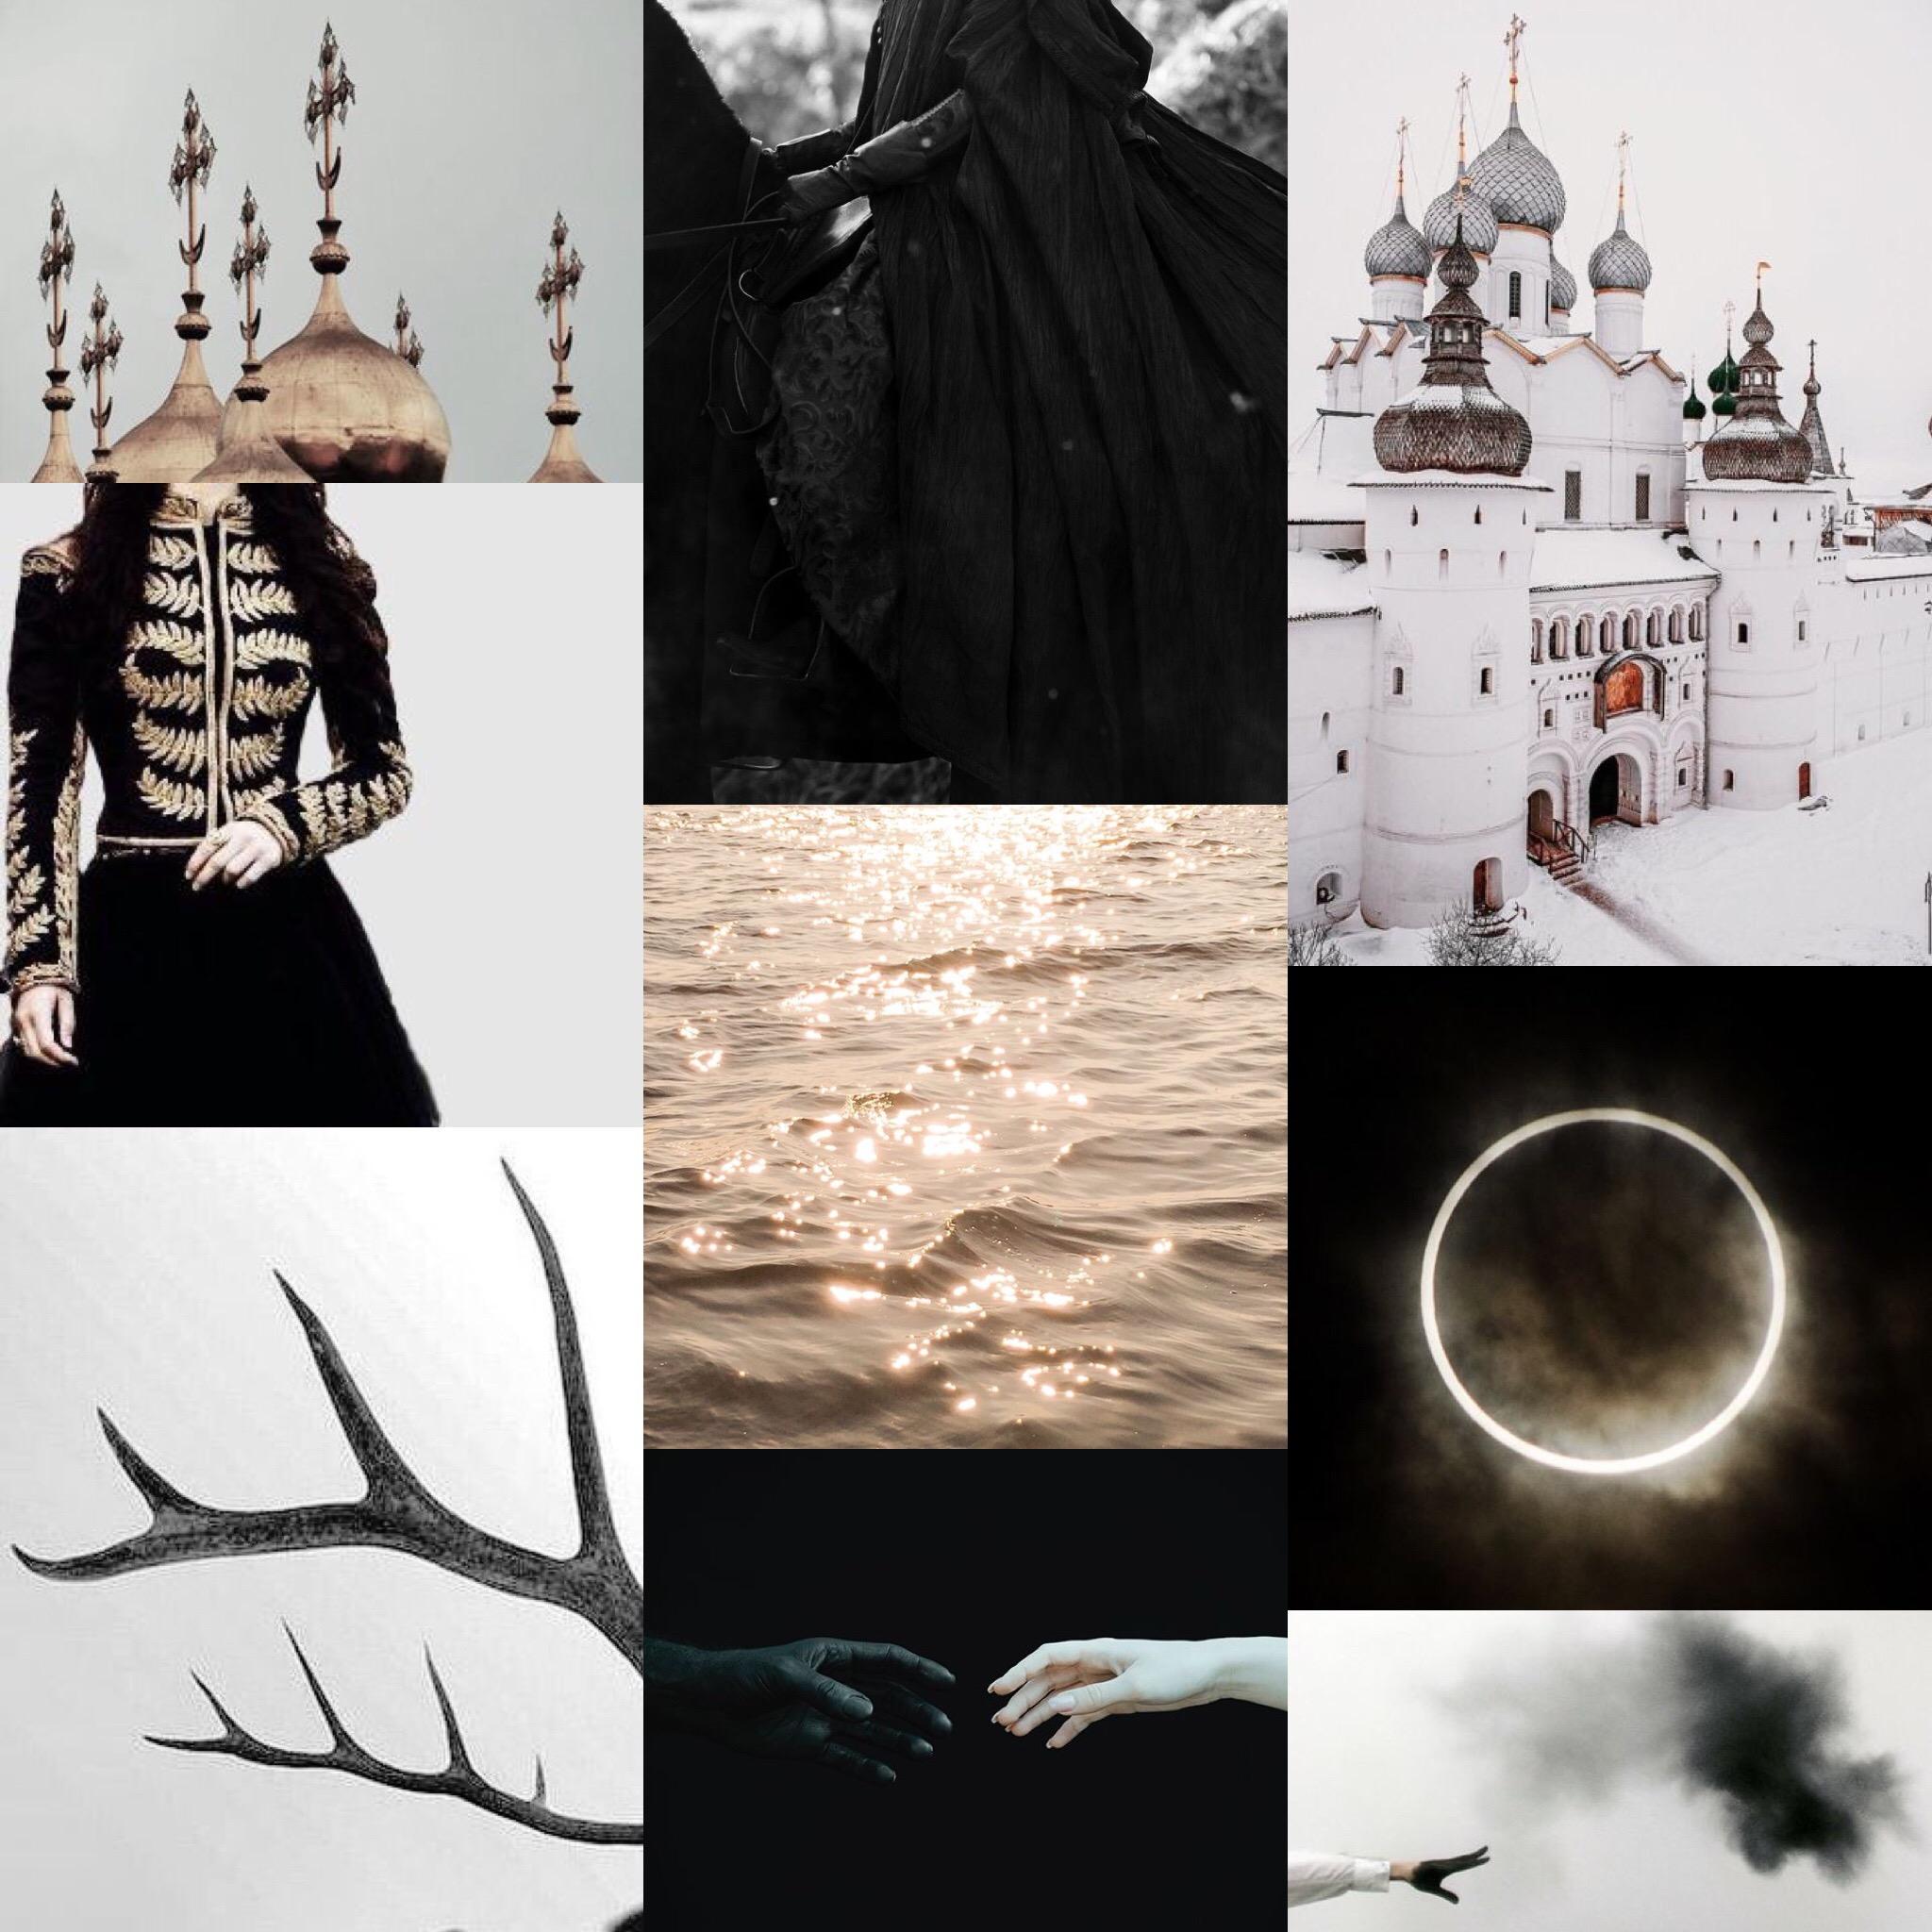 2. - Shadow and Bone //Leigh Bardugo